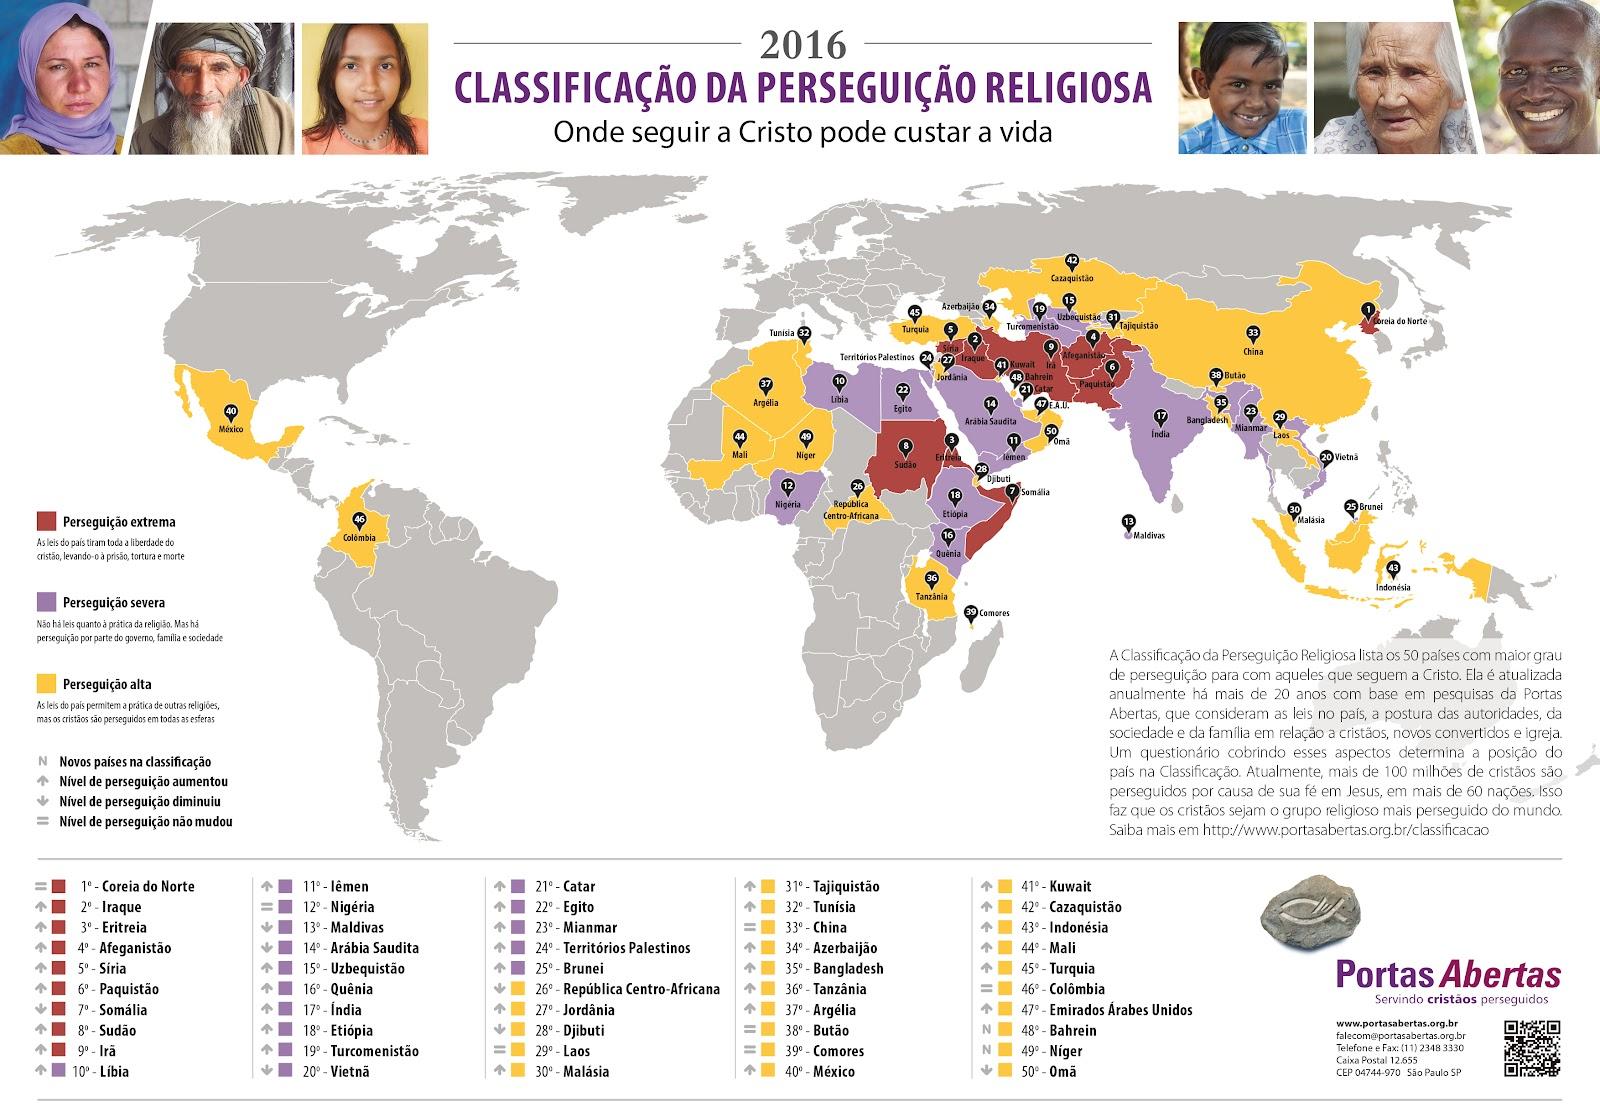 Cristianismo perseguido - mapa mundial 2016.jpg